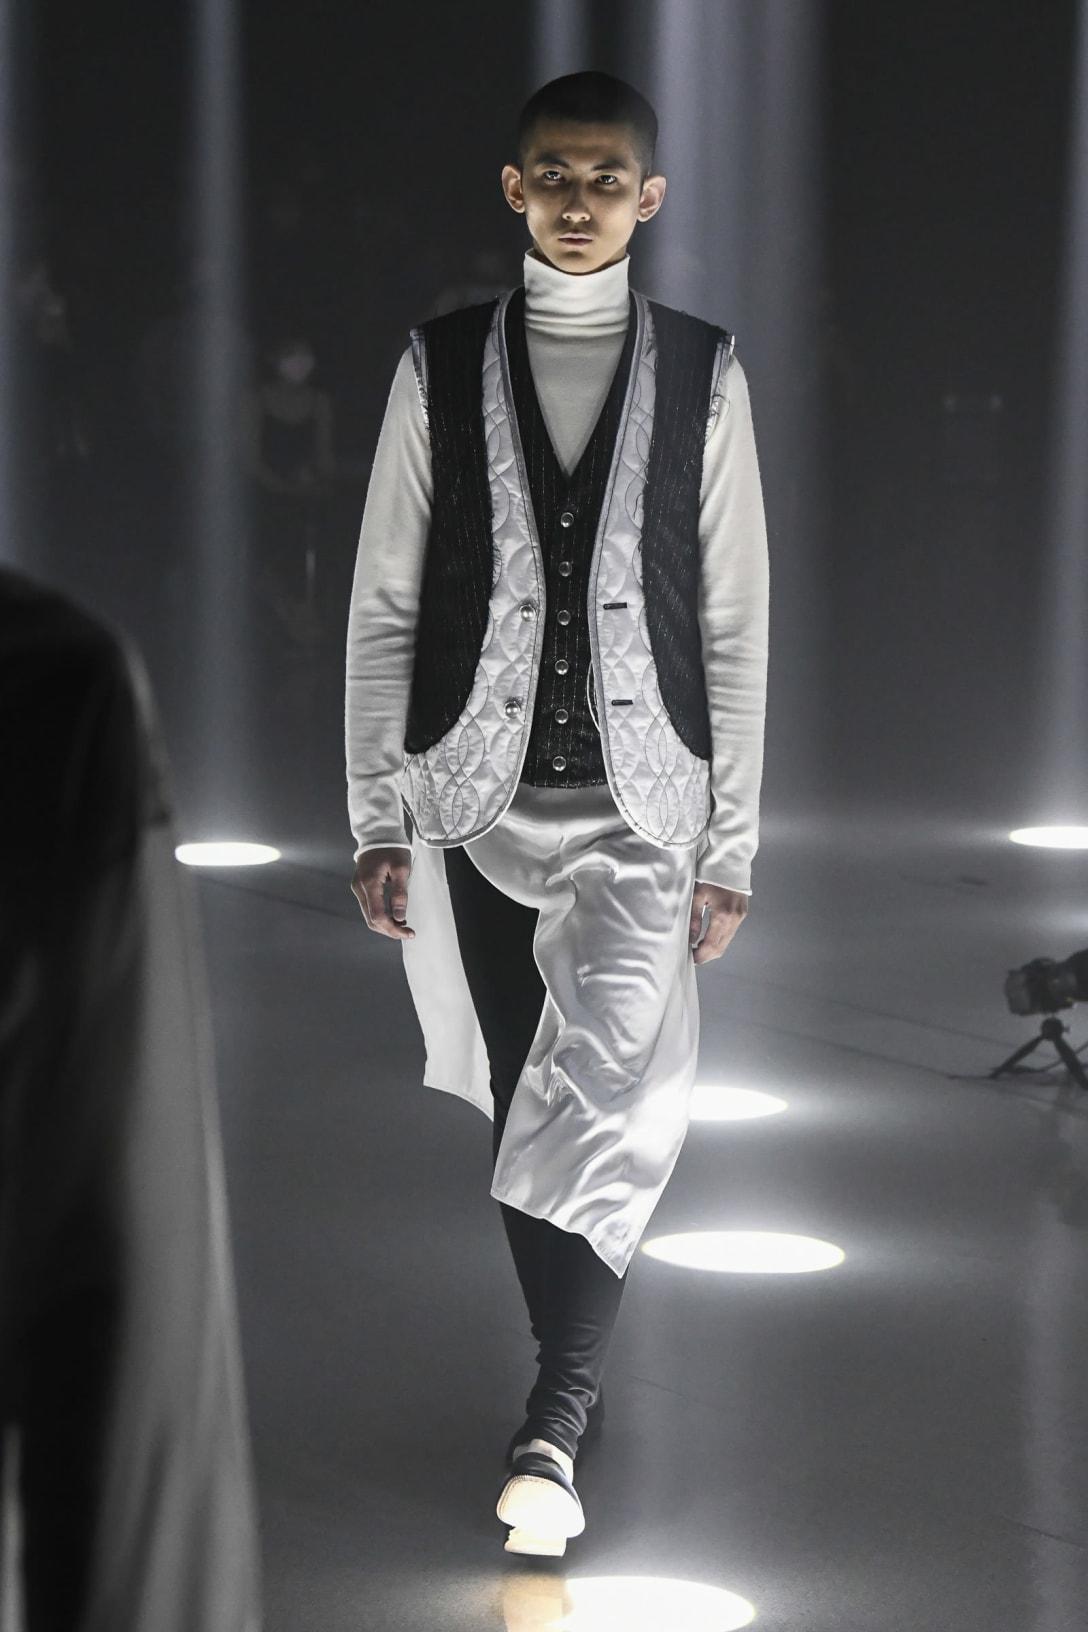 「sulvam」2021年秋冬コレクション Image by FASHIONSNAP.COM(Look:Mika Inoue、Atmosphere:Ippei Saito)